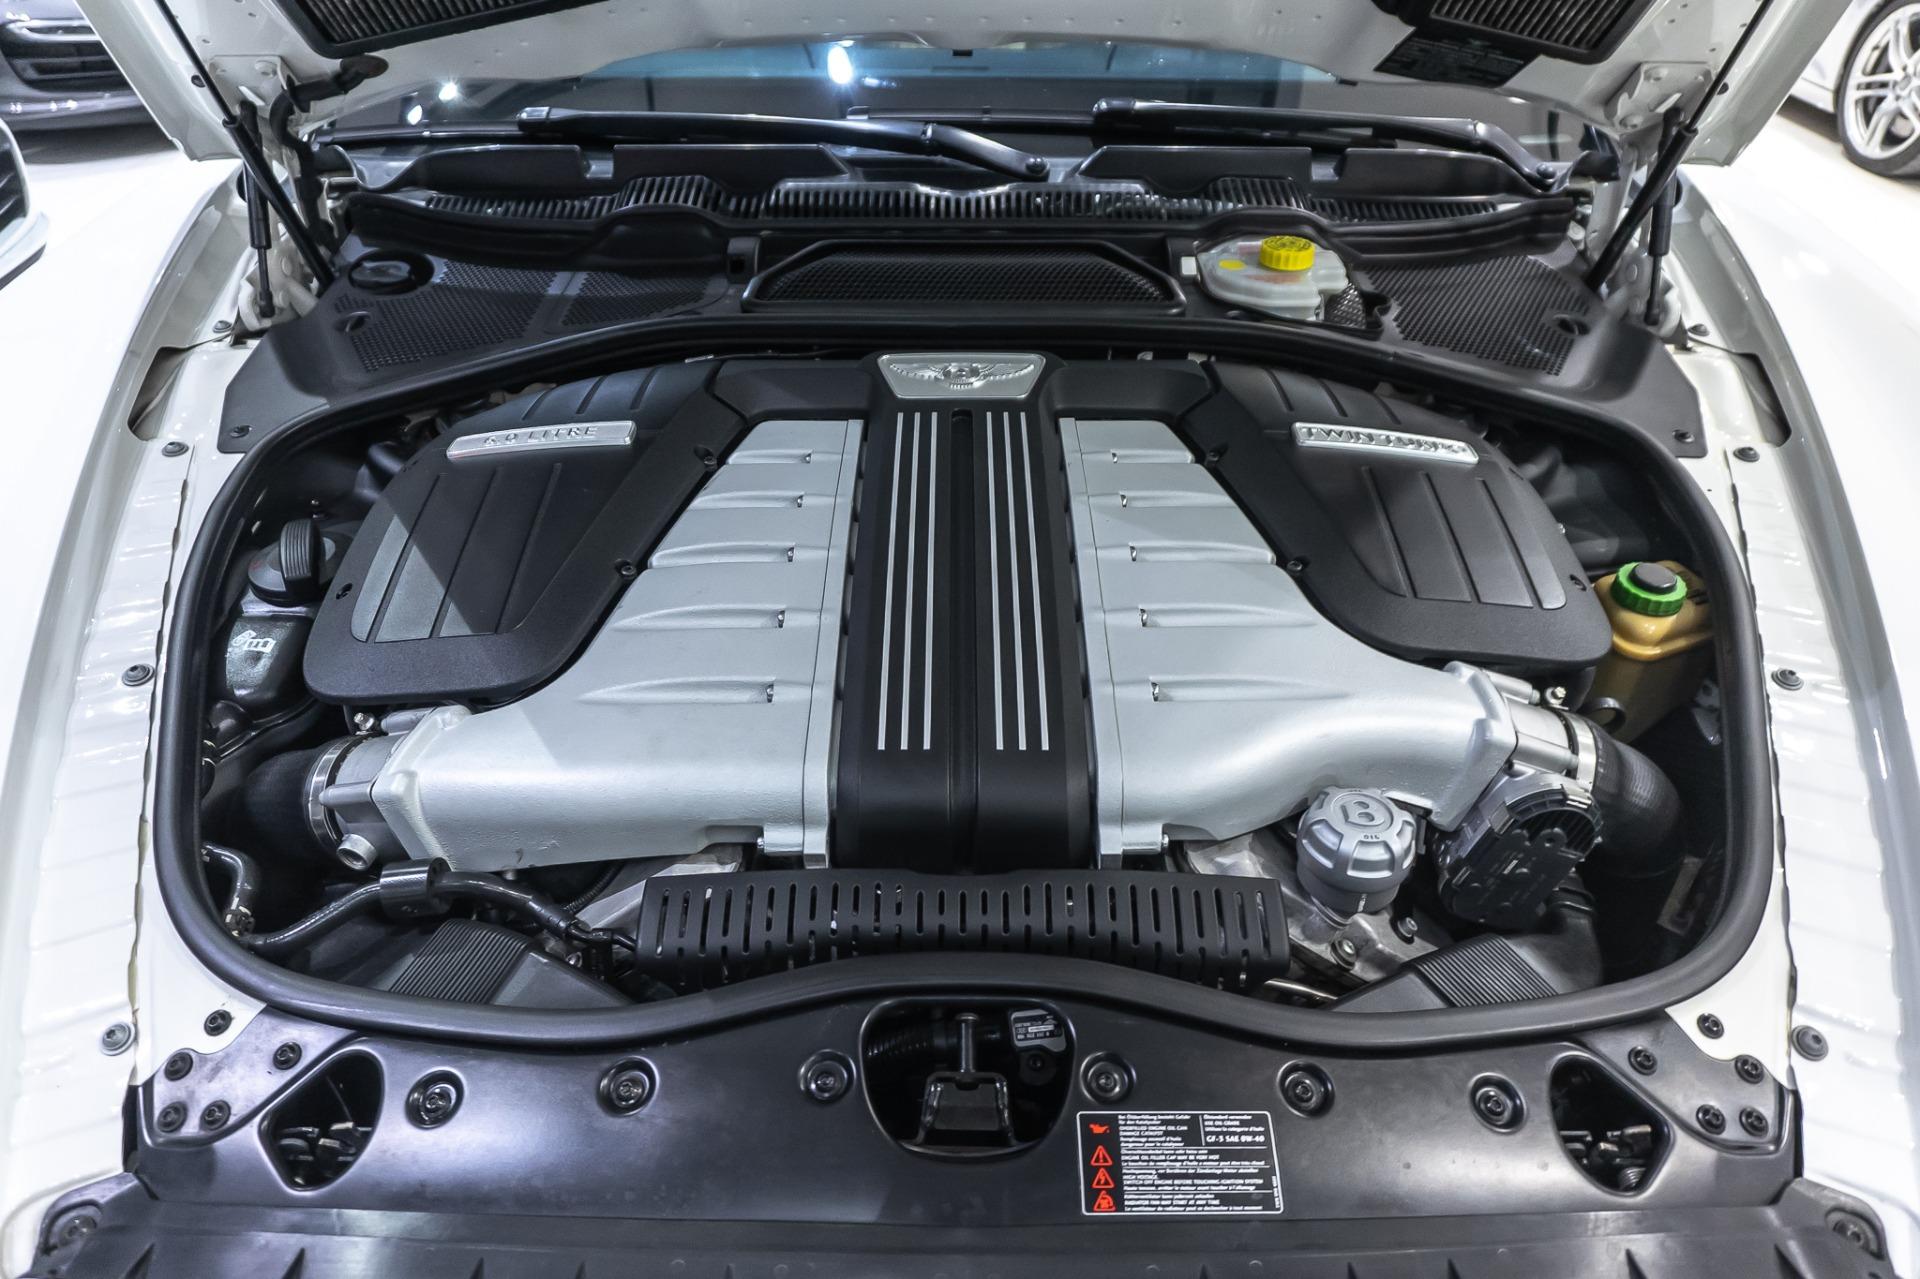 Used-2014-Bentley-Flying-Spur-W12-Sedan-LOADED-Glacier-White